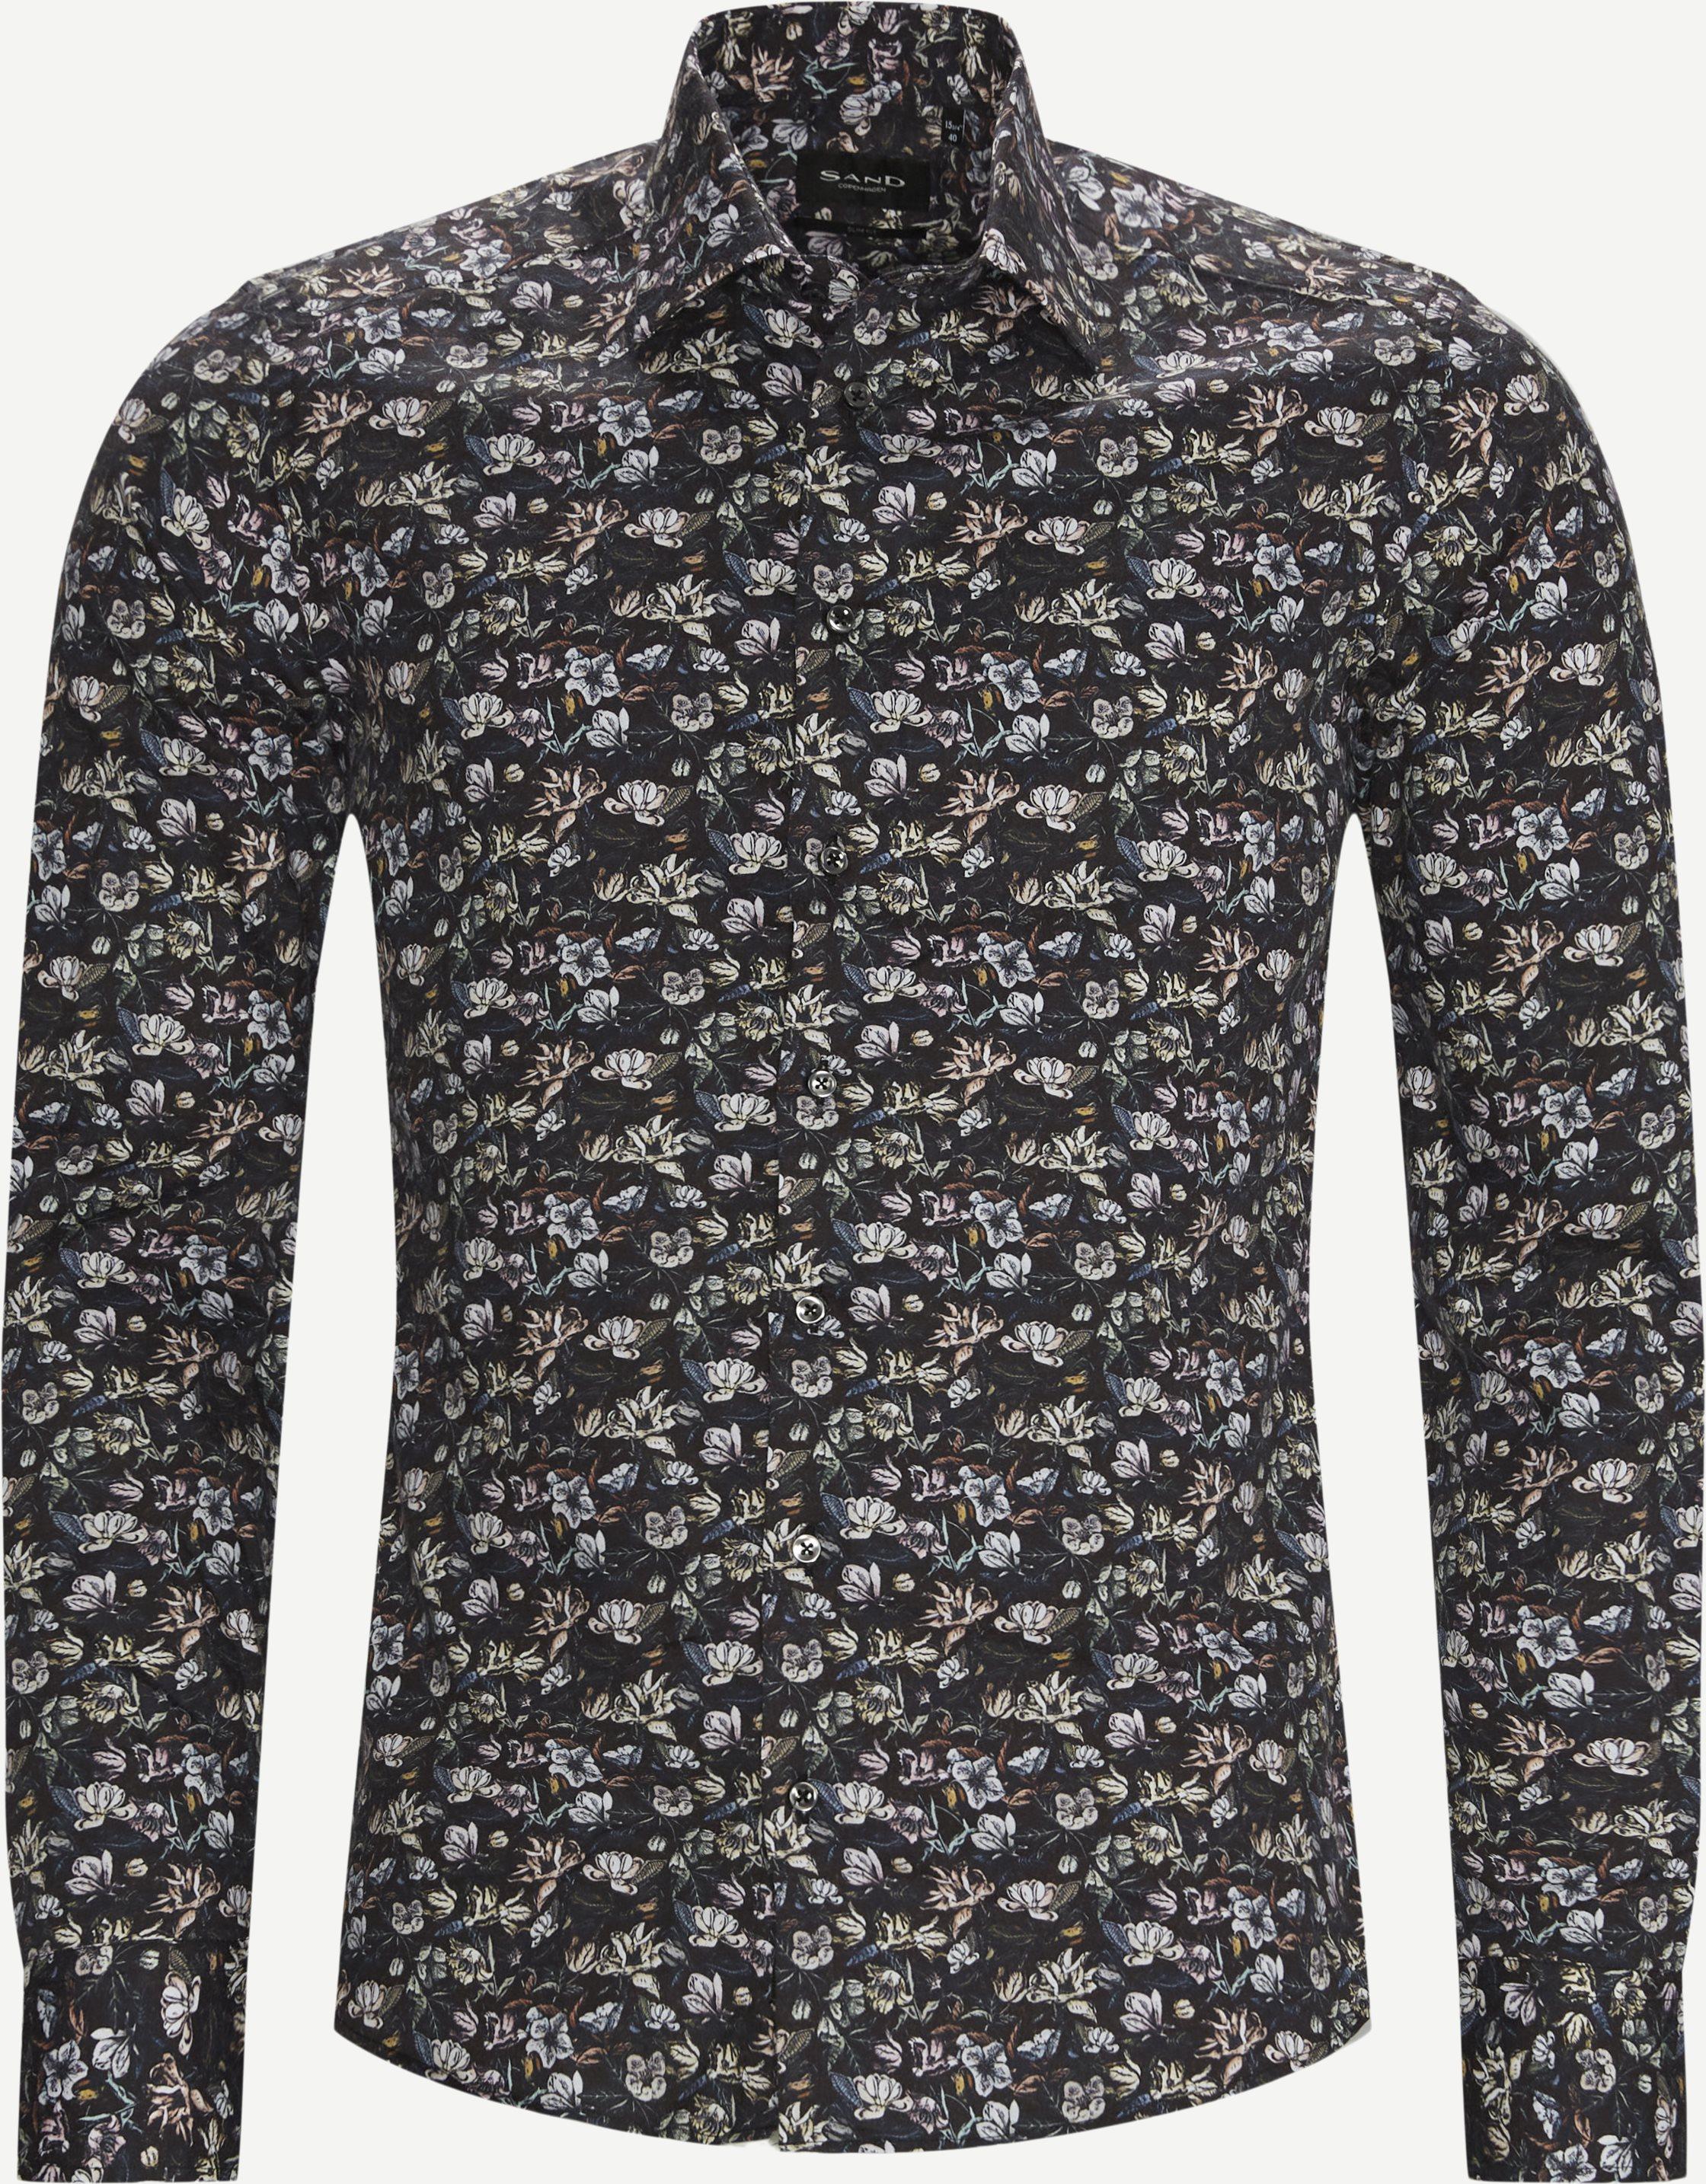 Hemden - Schwarz